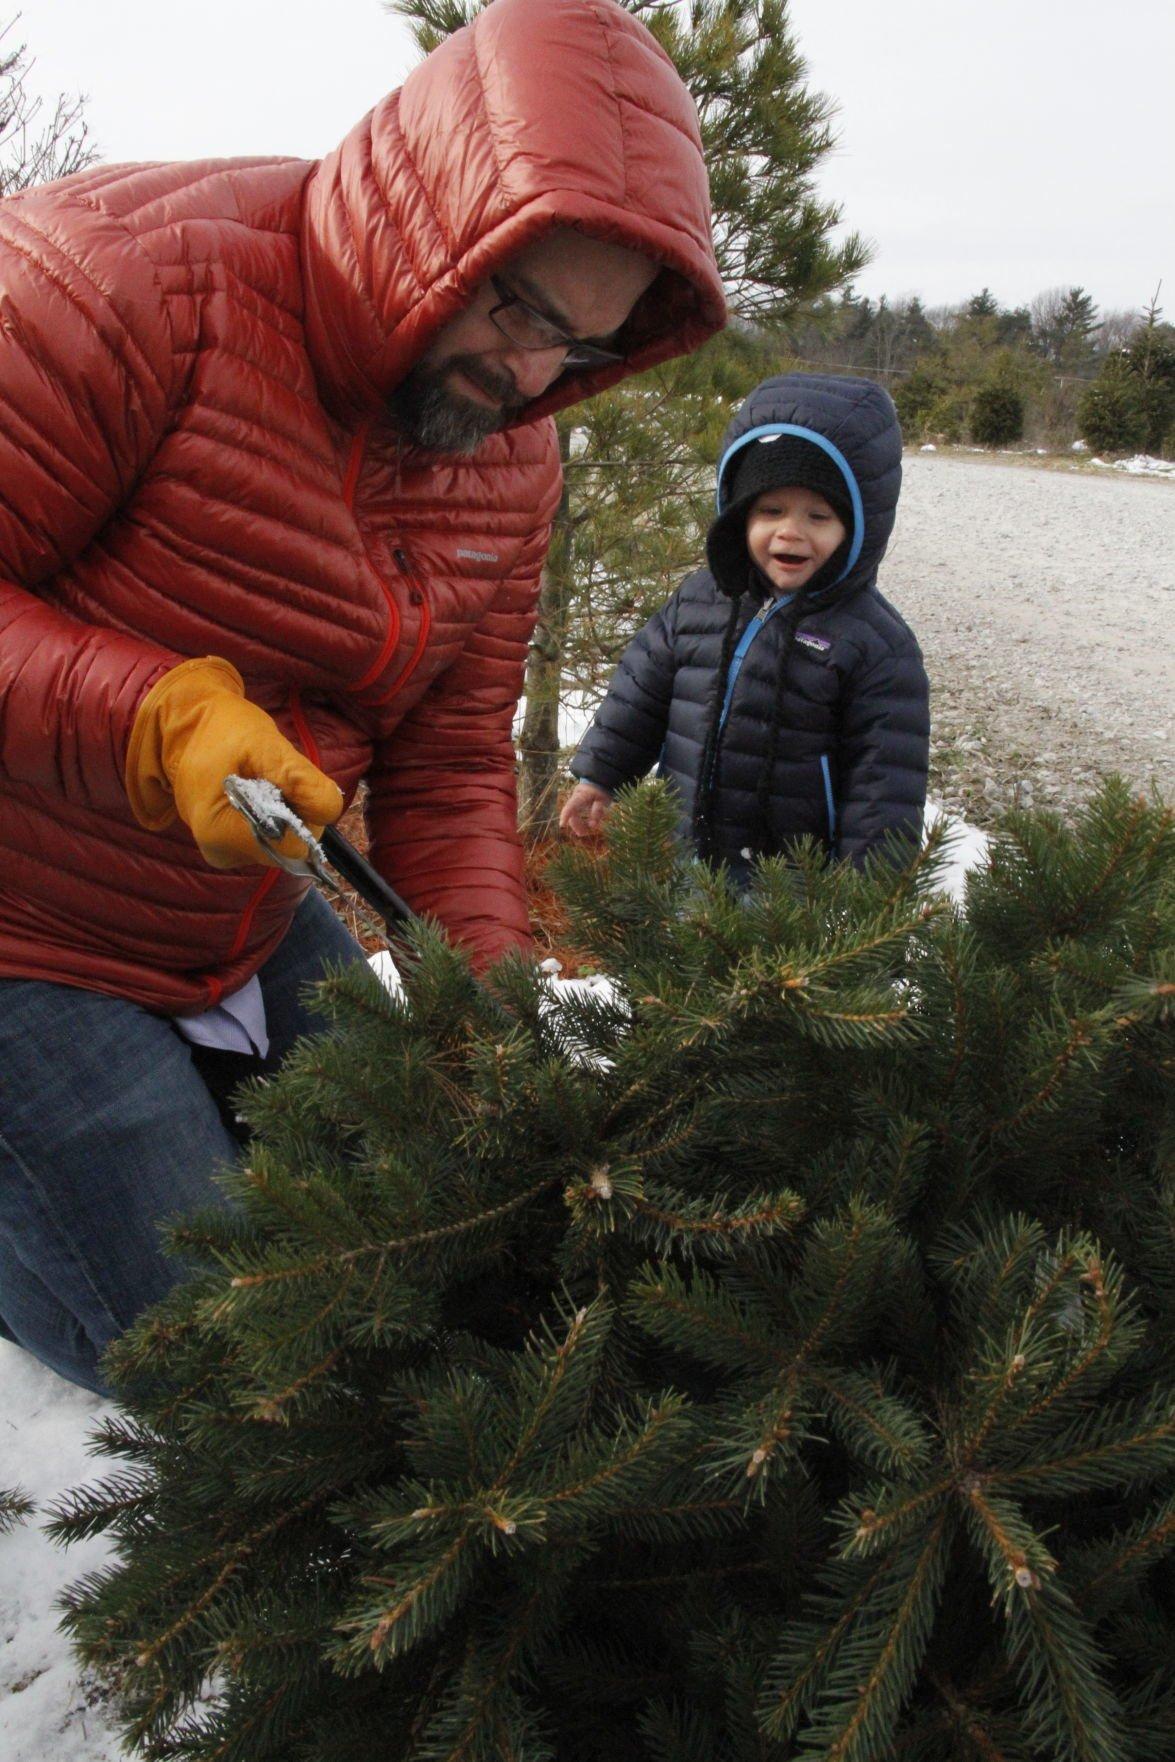 Luers Christmas tree farm becoming a holiday memory | Lake ...